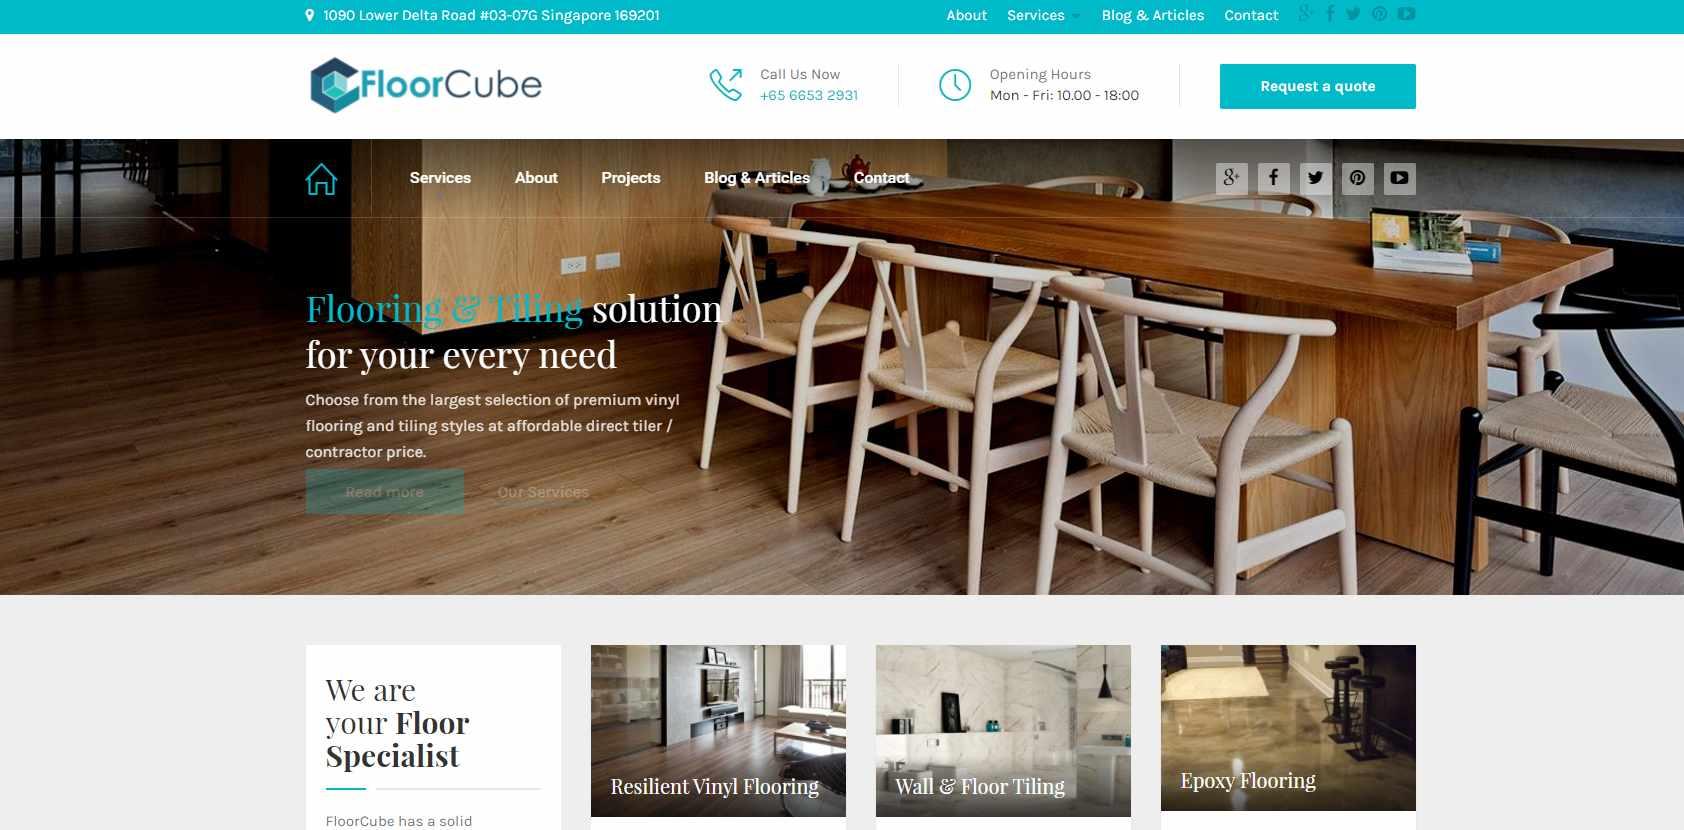 floor cube Top Epoxy Flooring Provider in Singapore